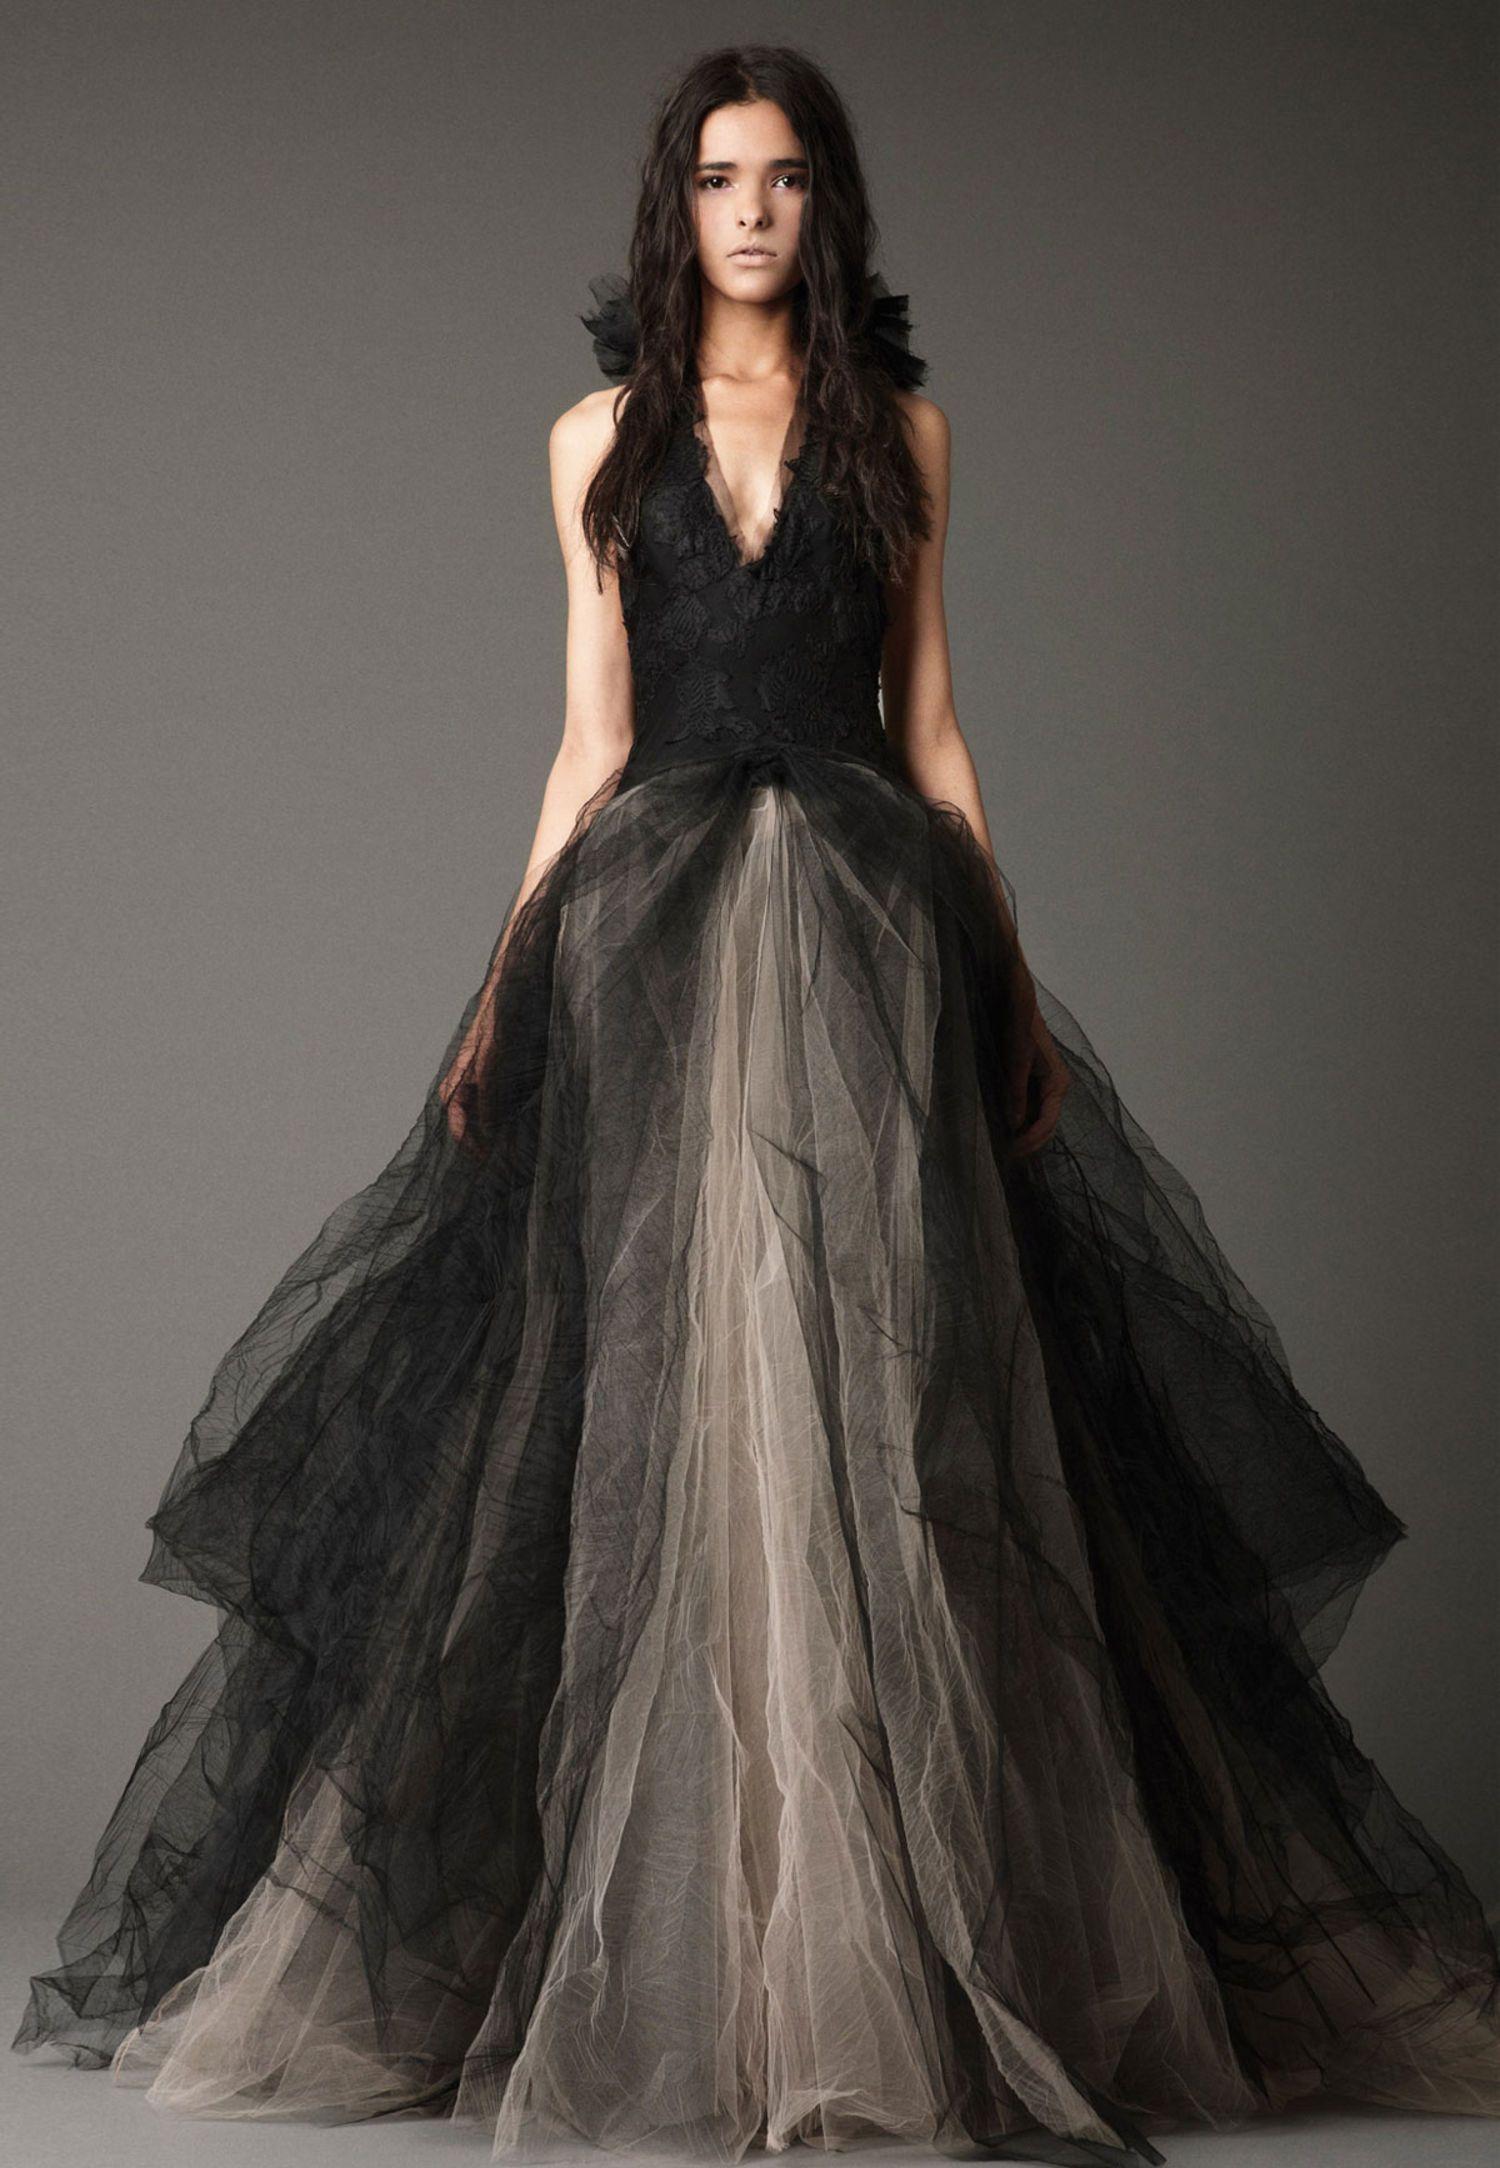 Shenae Grimes\' Wedding Dress: The Bride Wore One of the BLACK Vera ...